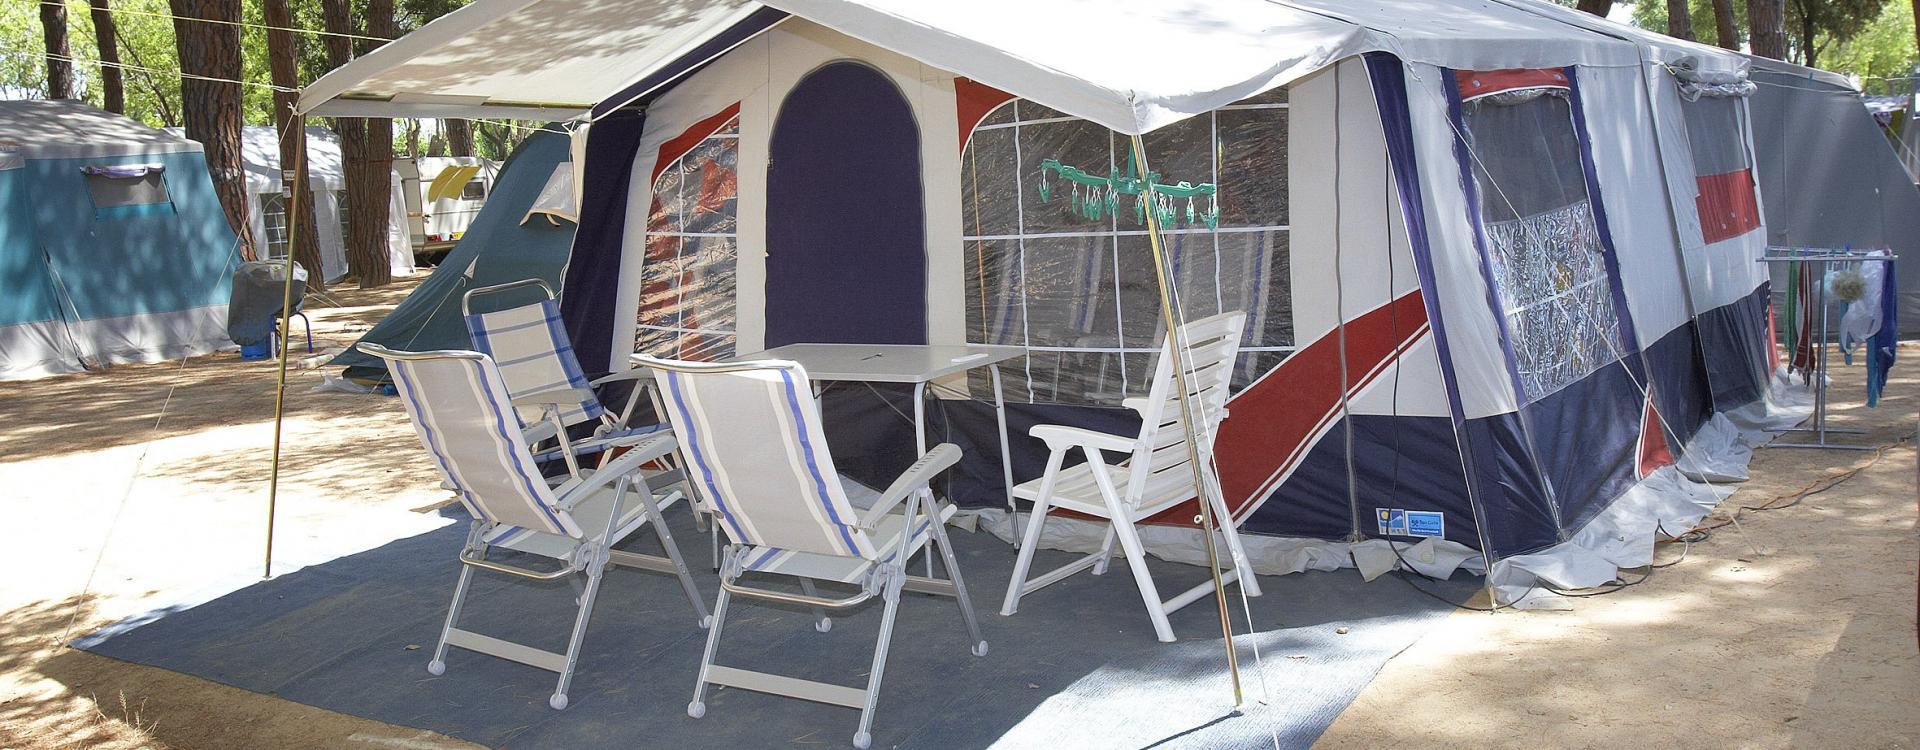 Tenda muntada al Camping Valldaro